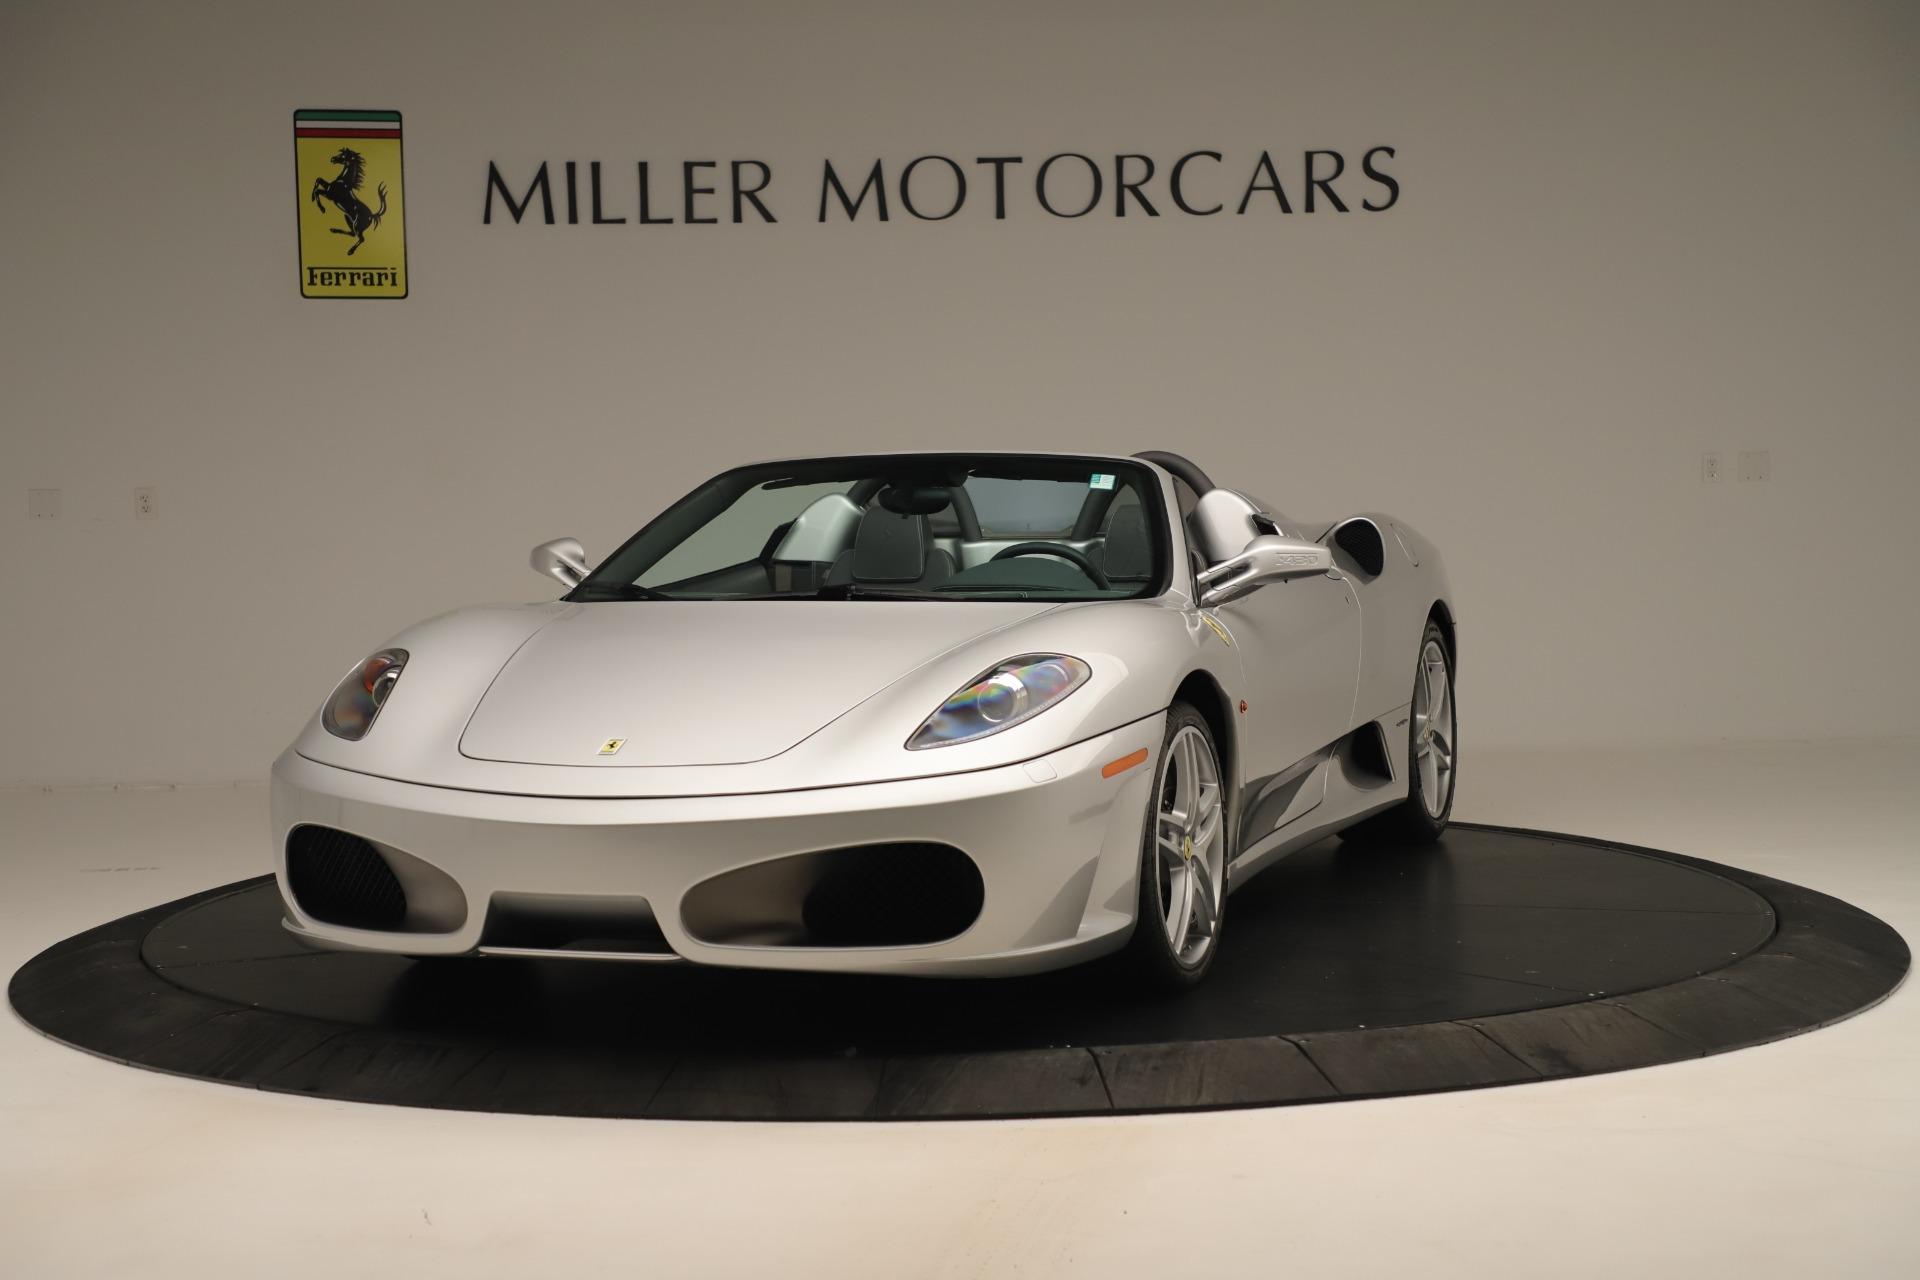 Used 2008 Ferrari F430 Spider for sale $129,900 at Maserati of Westport in Westport CT 06880 1